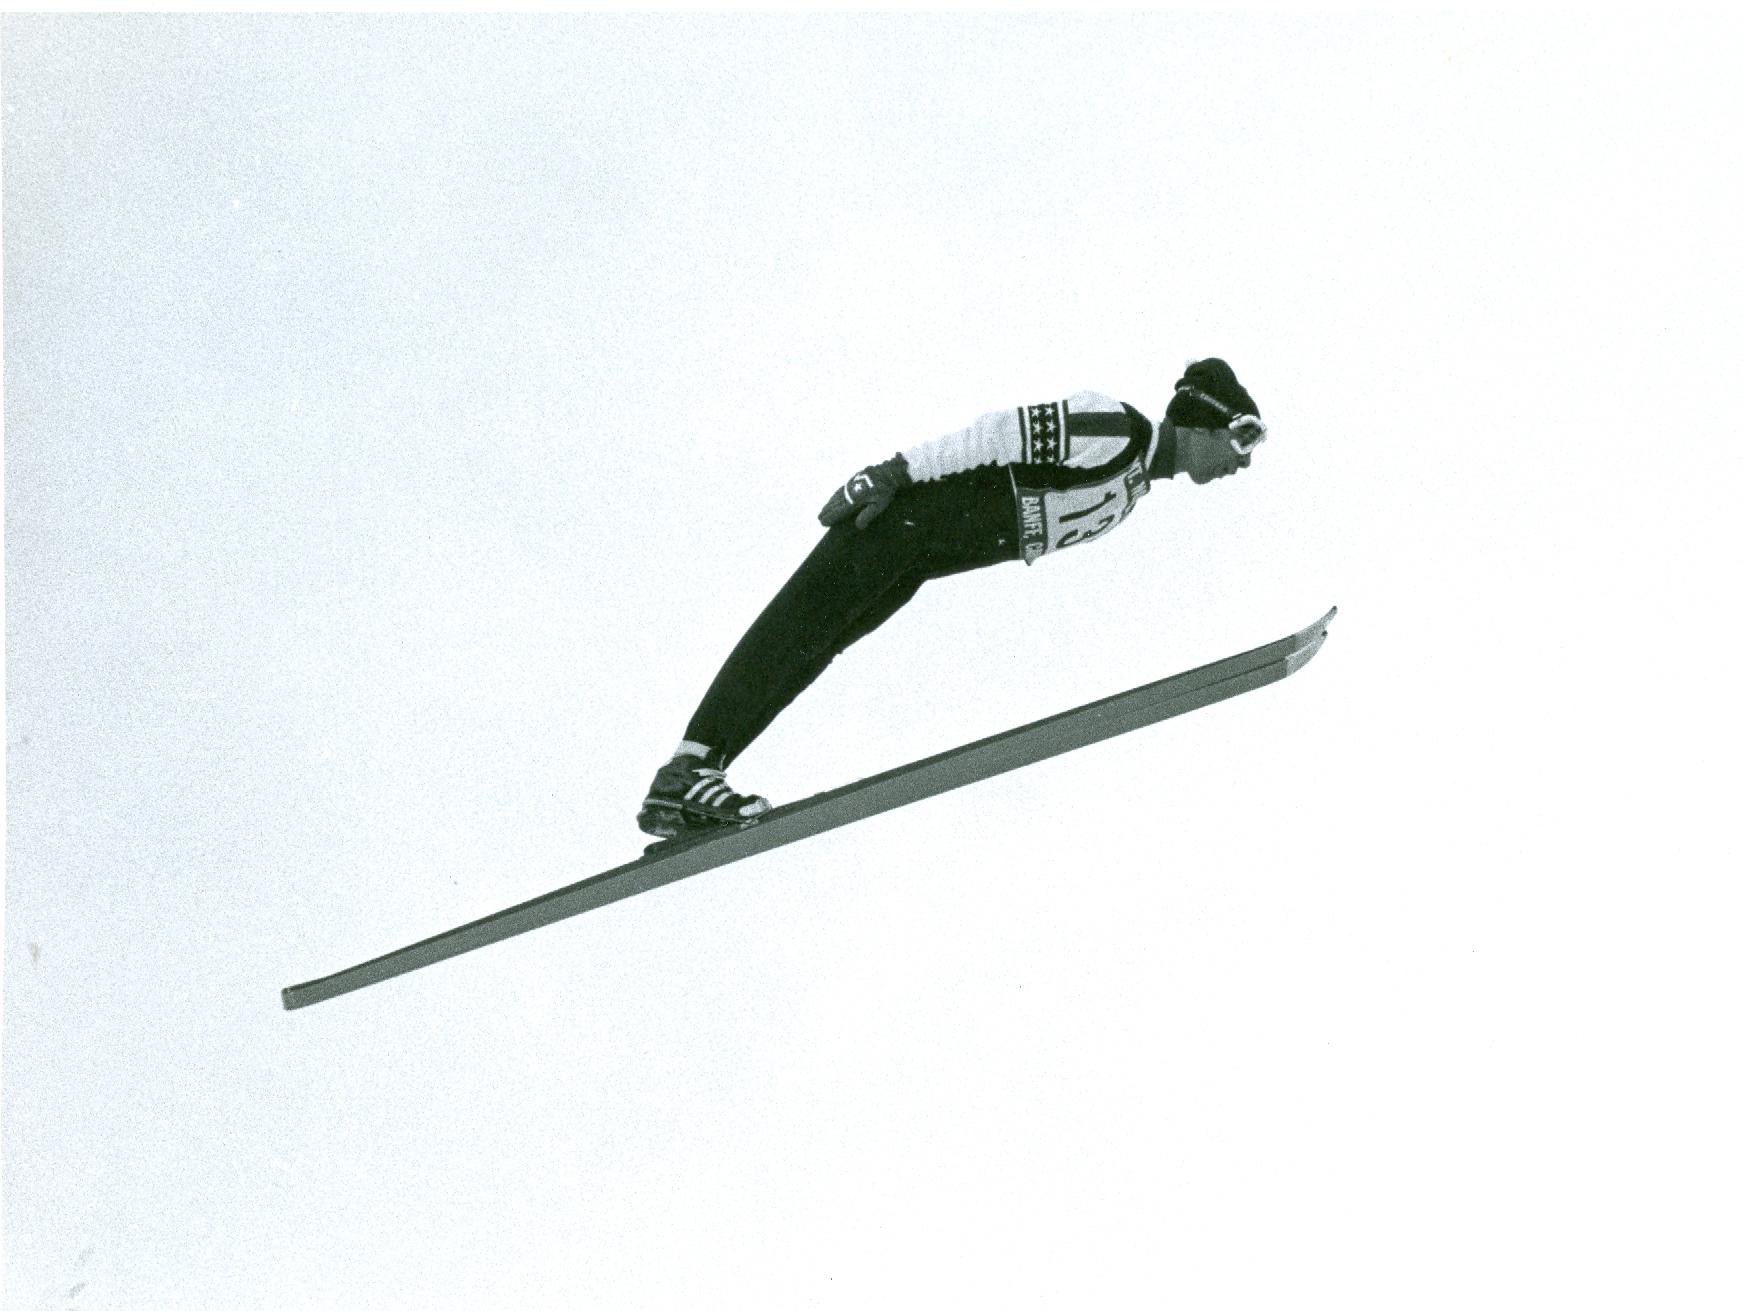 2010.027.004i - Unidified jumper.jpg